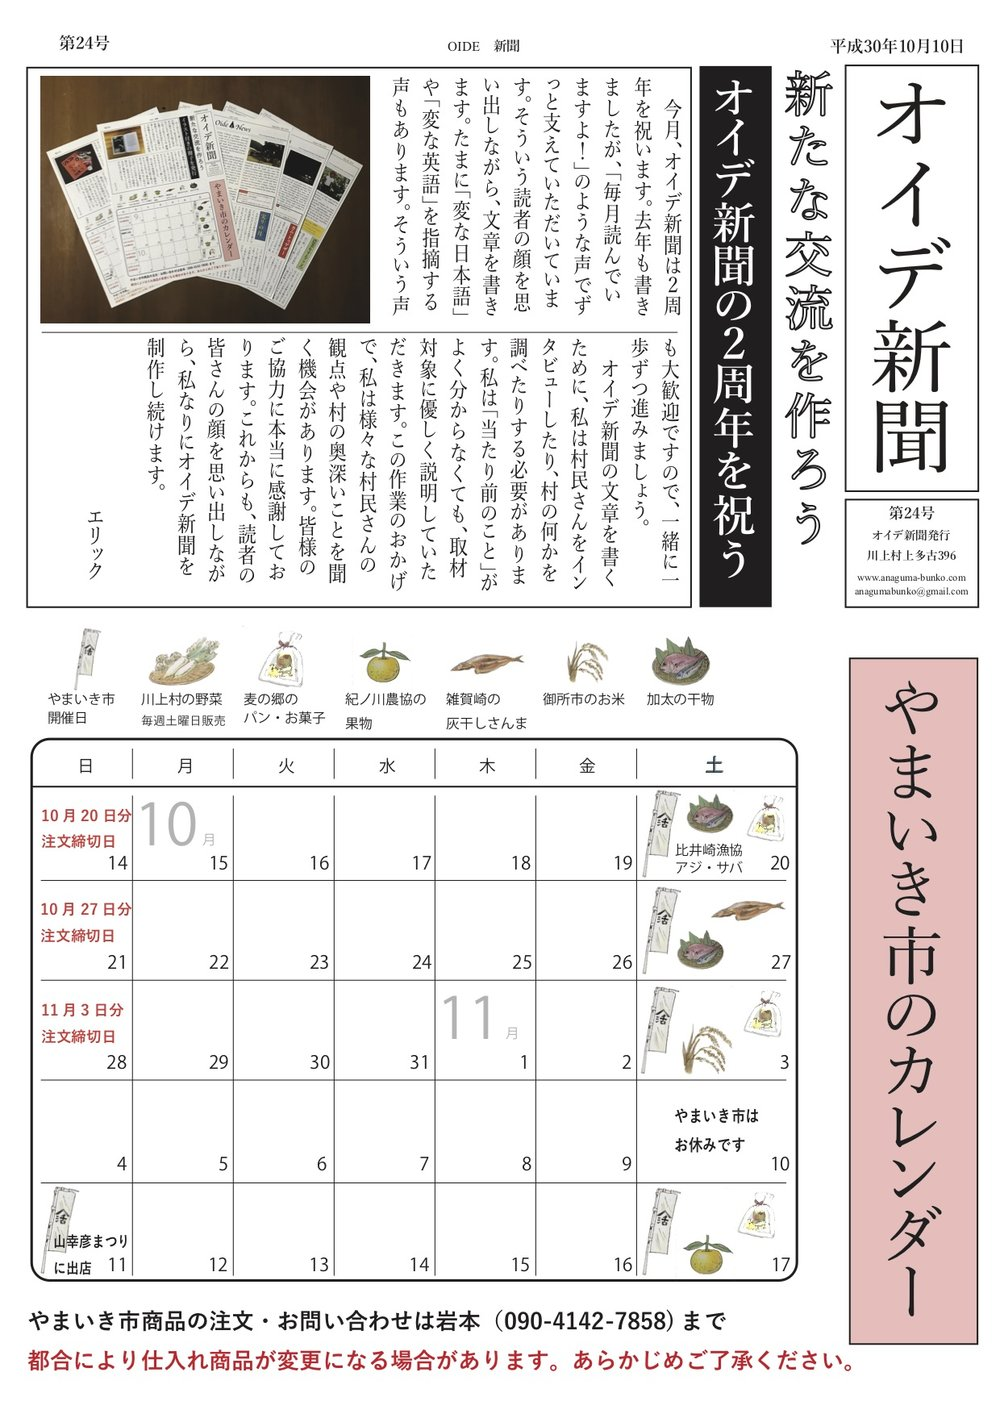 oide新聞30年10月号表.jpg